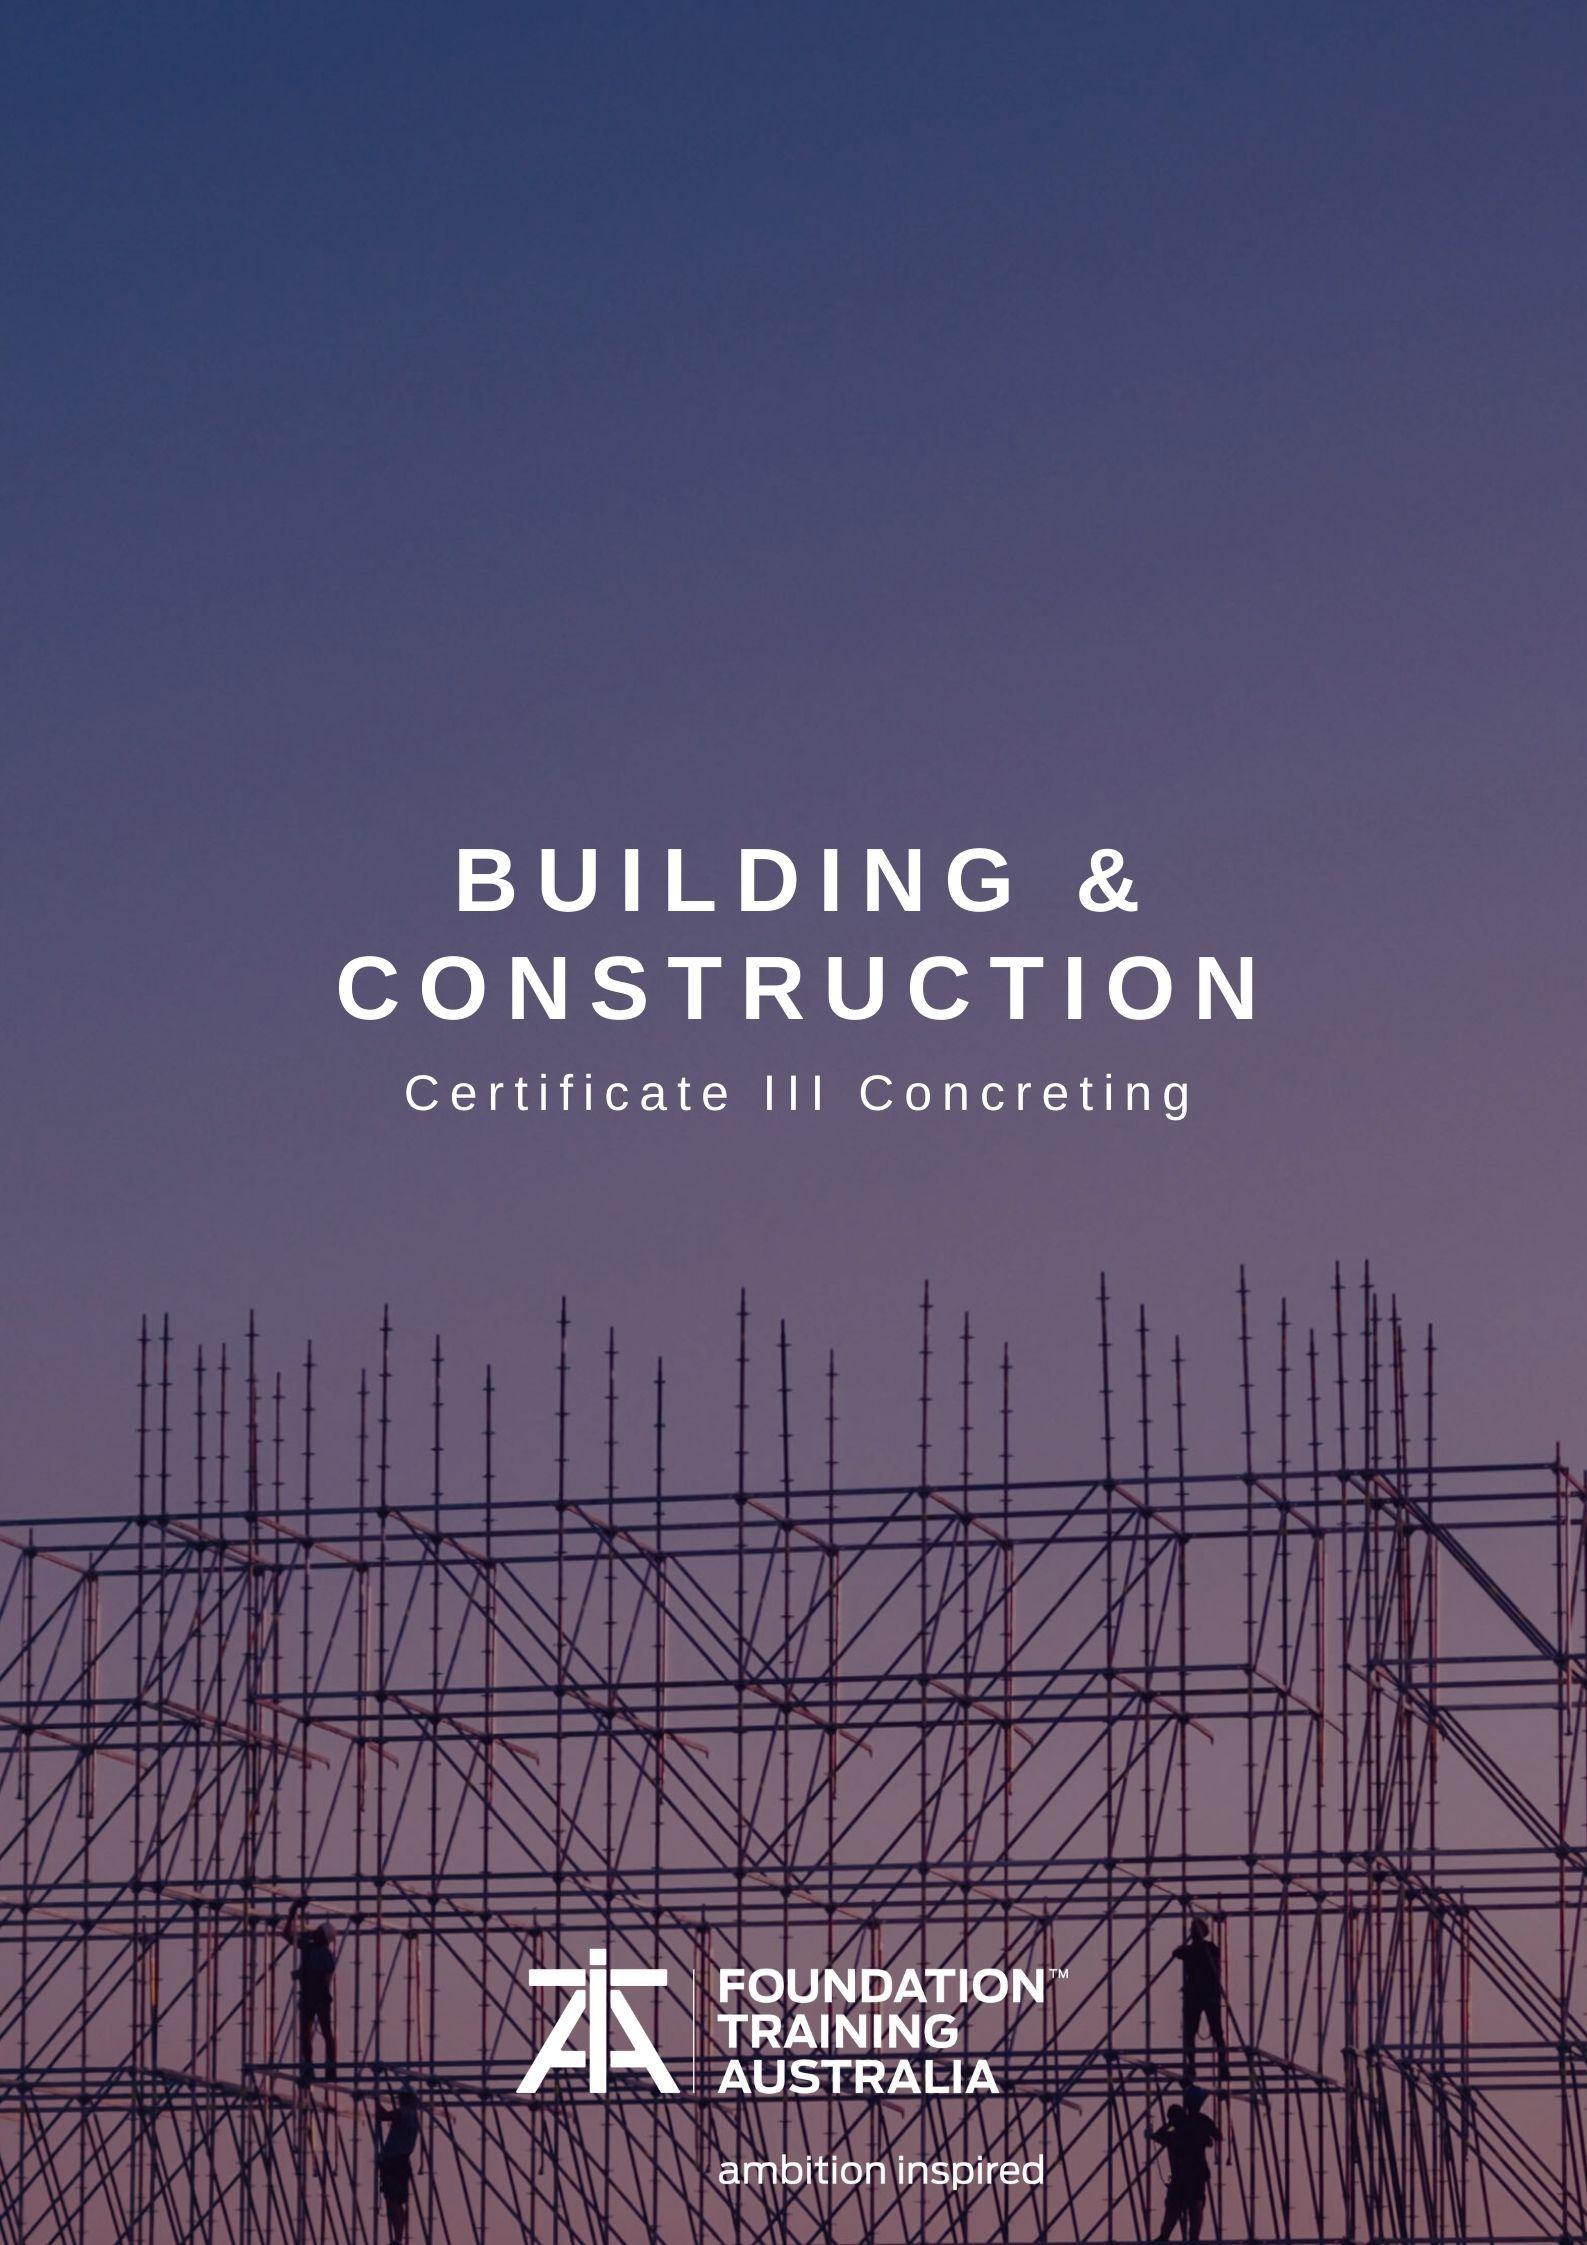 https://www.fta.edu.au/wp-content/uploads/2020/06/Building-Flyer-Covers-1.jpg